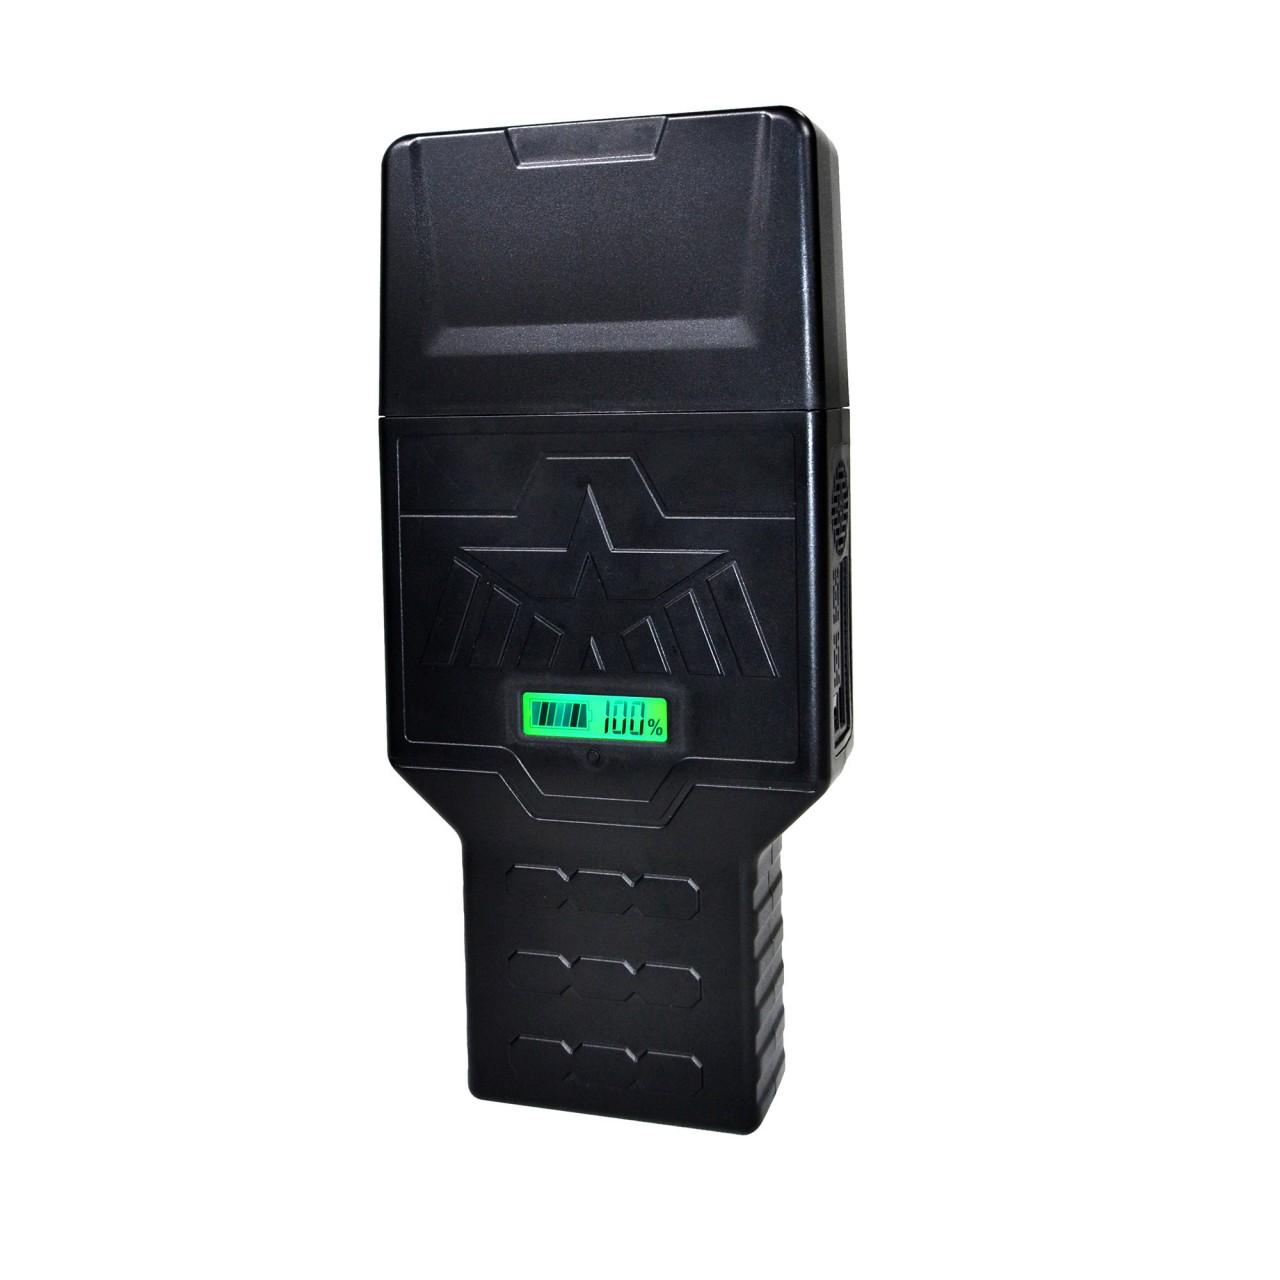 Muti-functional Portable Hidden 16 Antennas 5G Cell Phone Jammer WiFi GPS UHF VHF RC All In One Signal Blocker